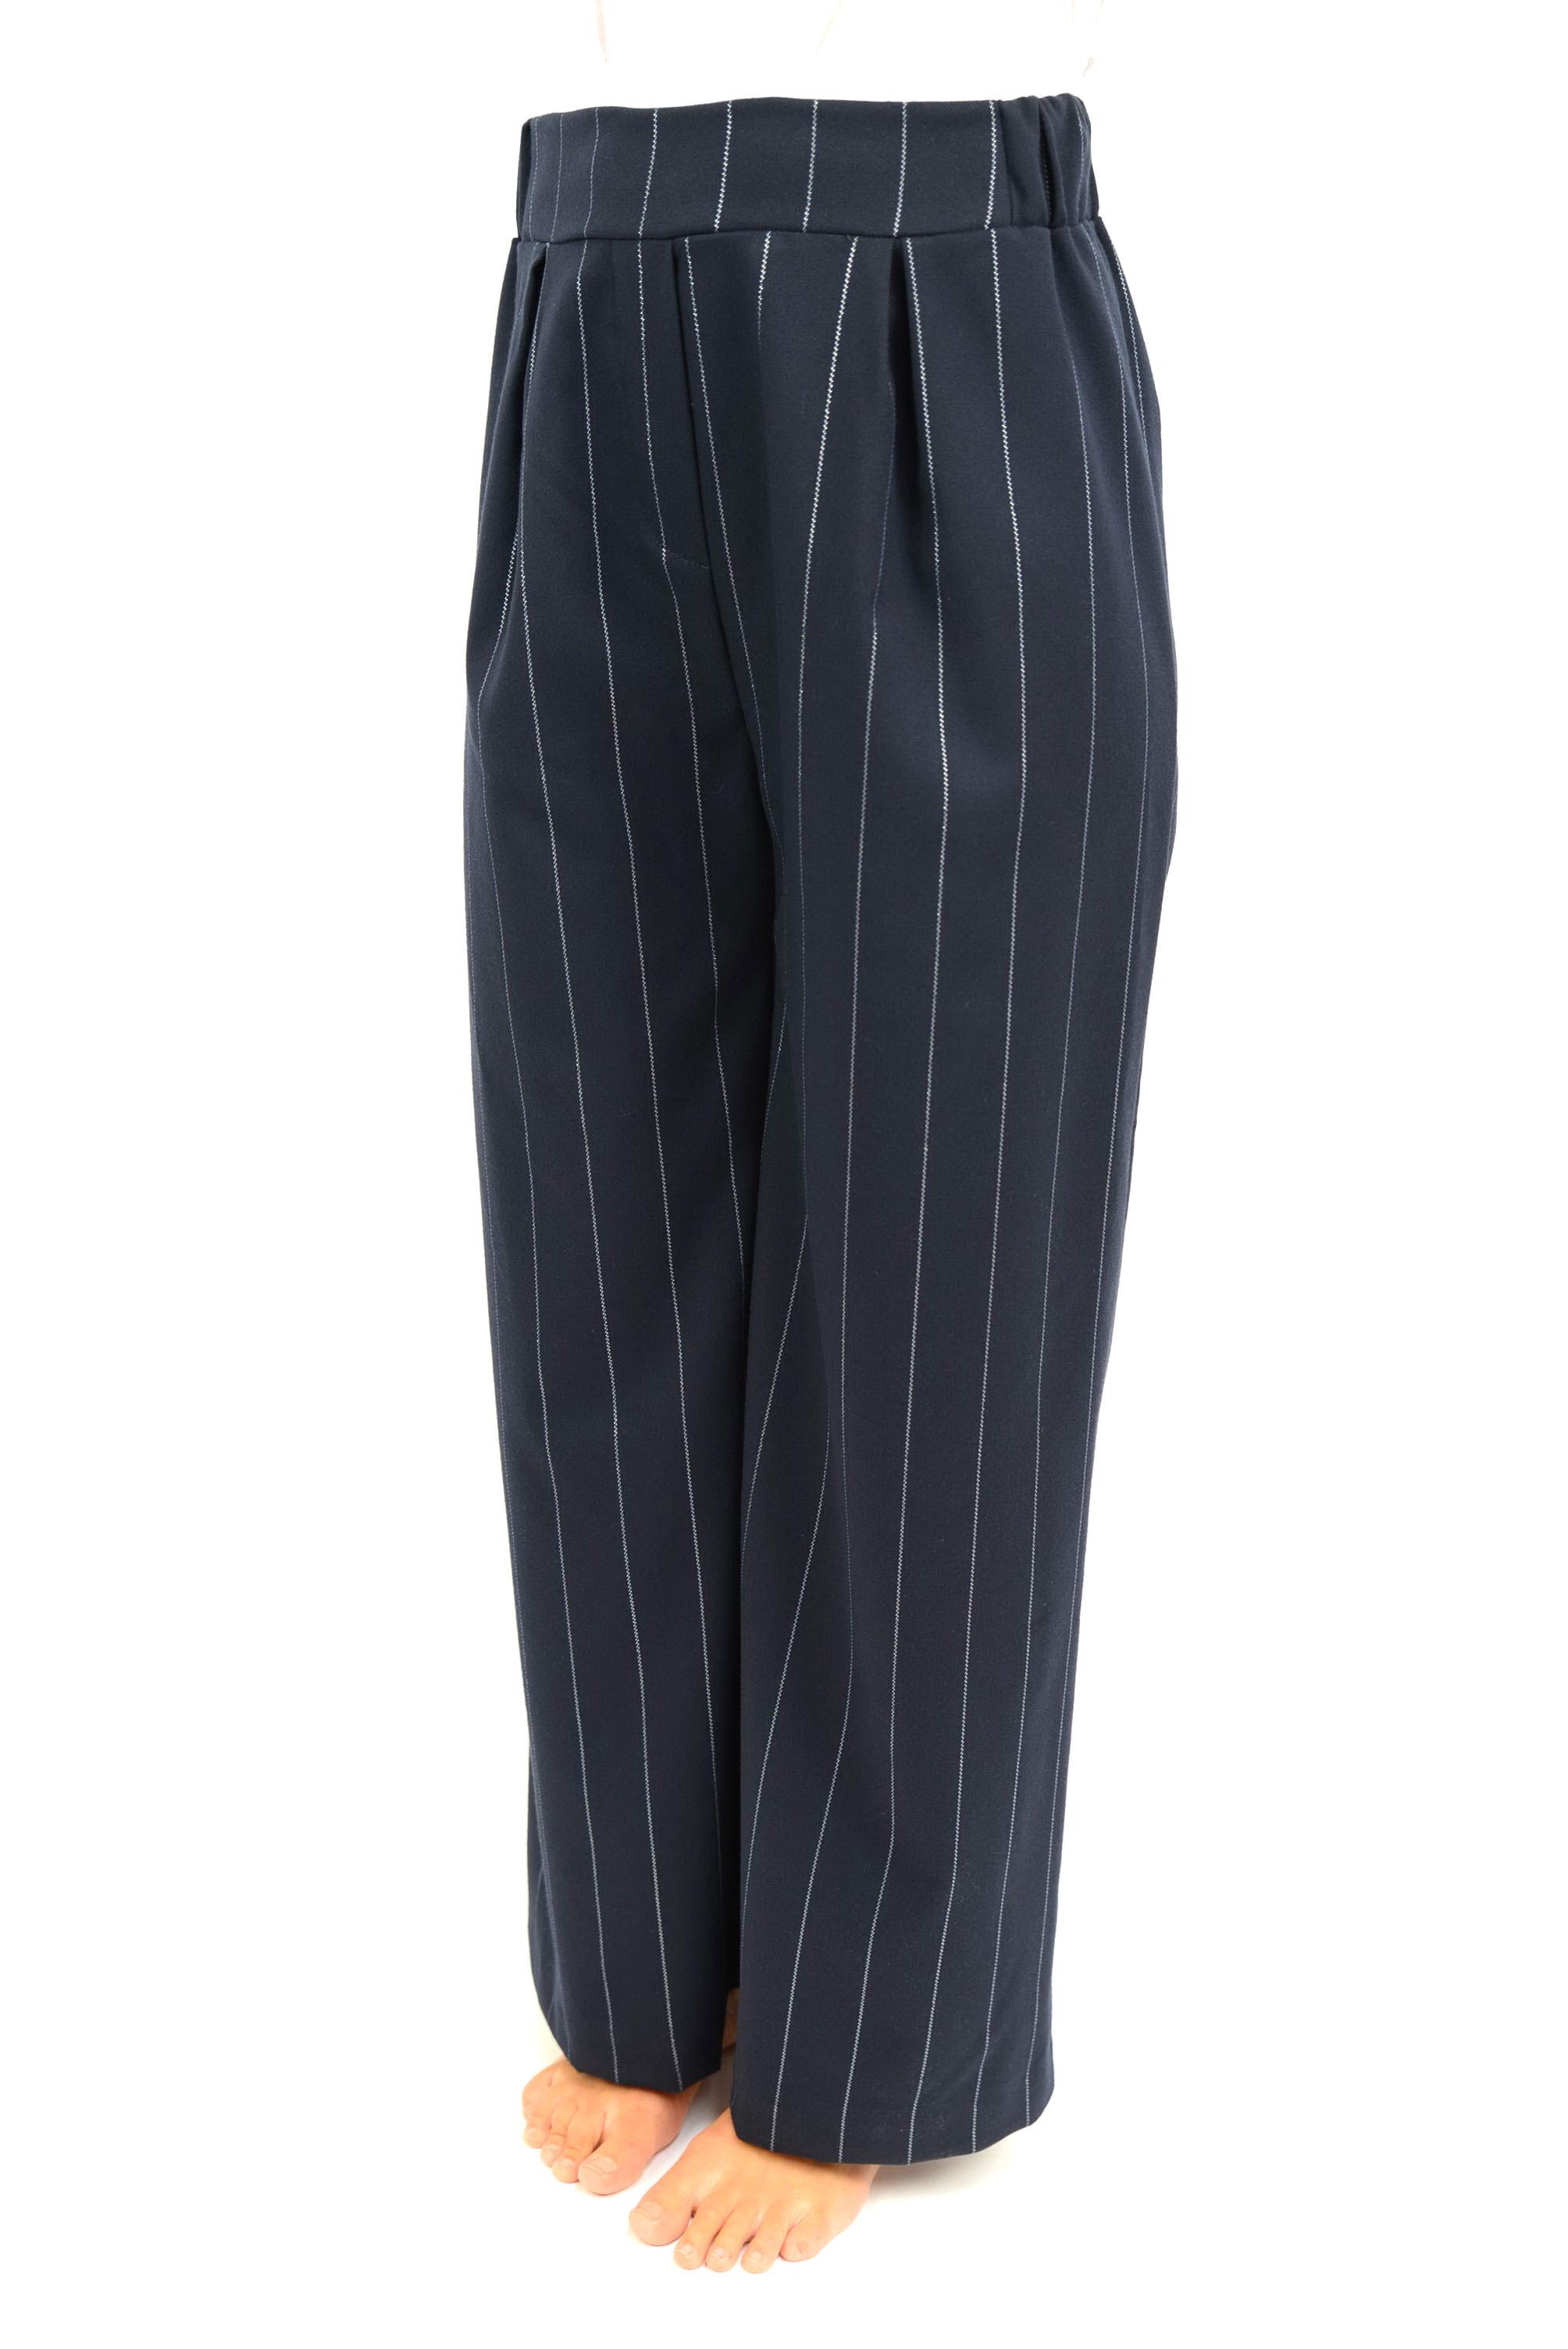 Gessato Donna Donna Pantalone Gessato Pantalone Gessato Pantalone Donna QhotsrdCxB